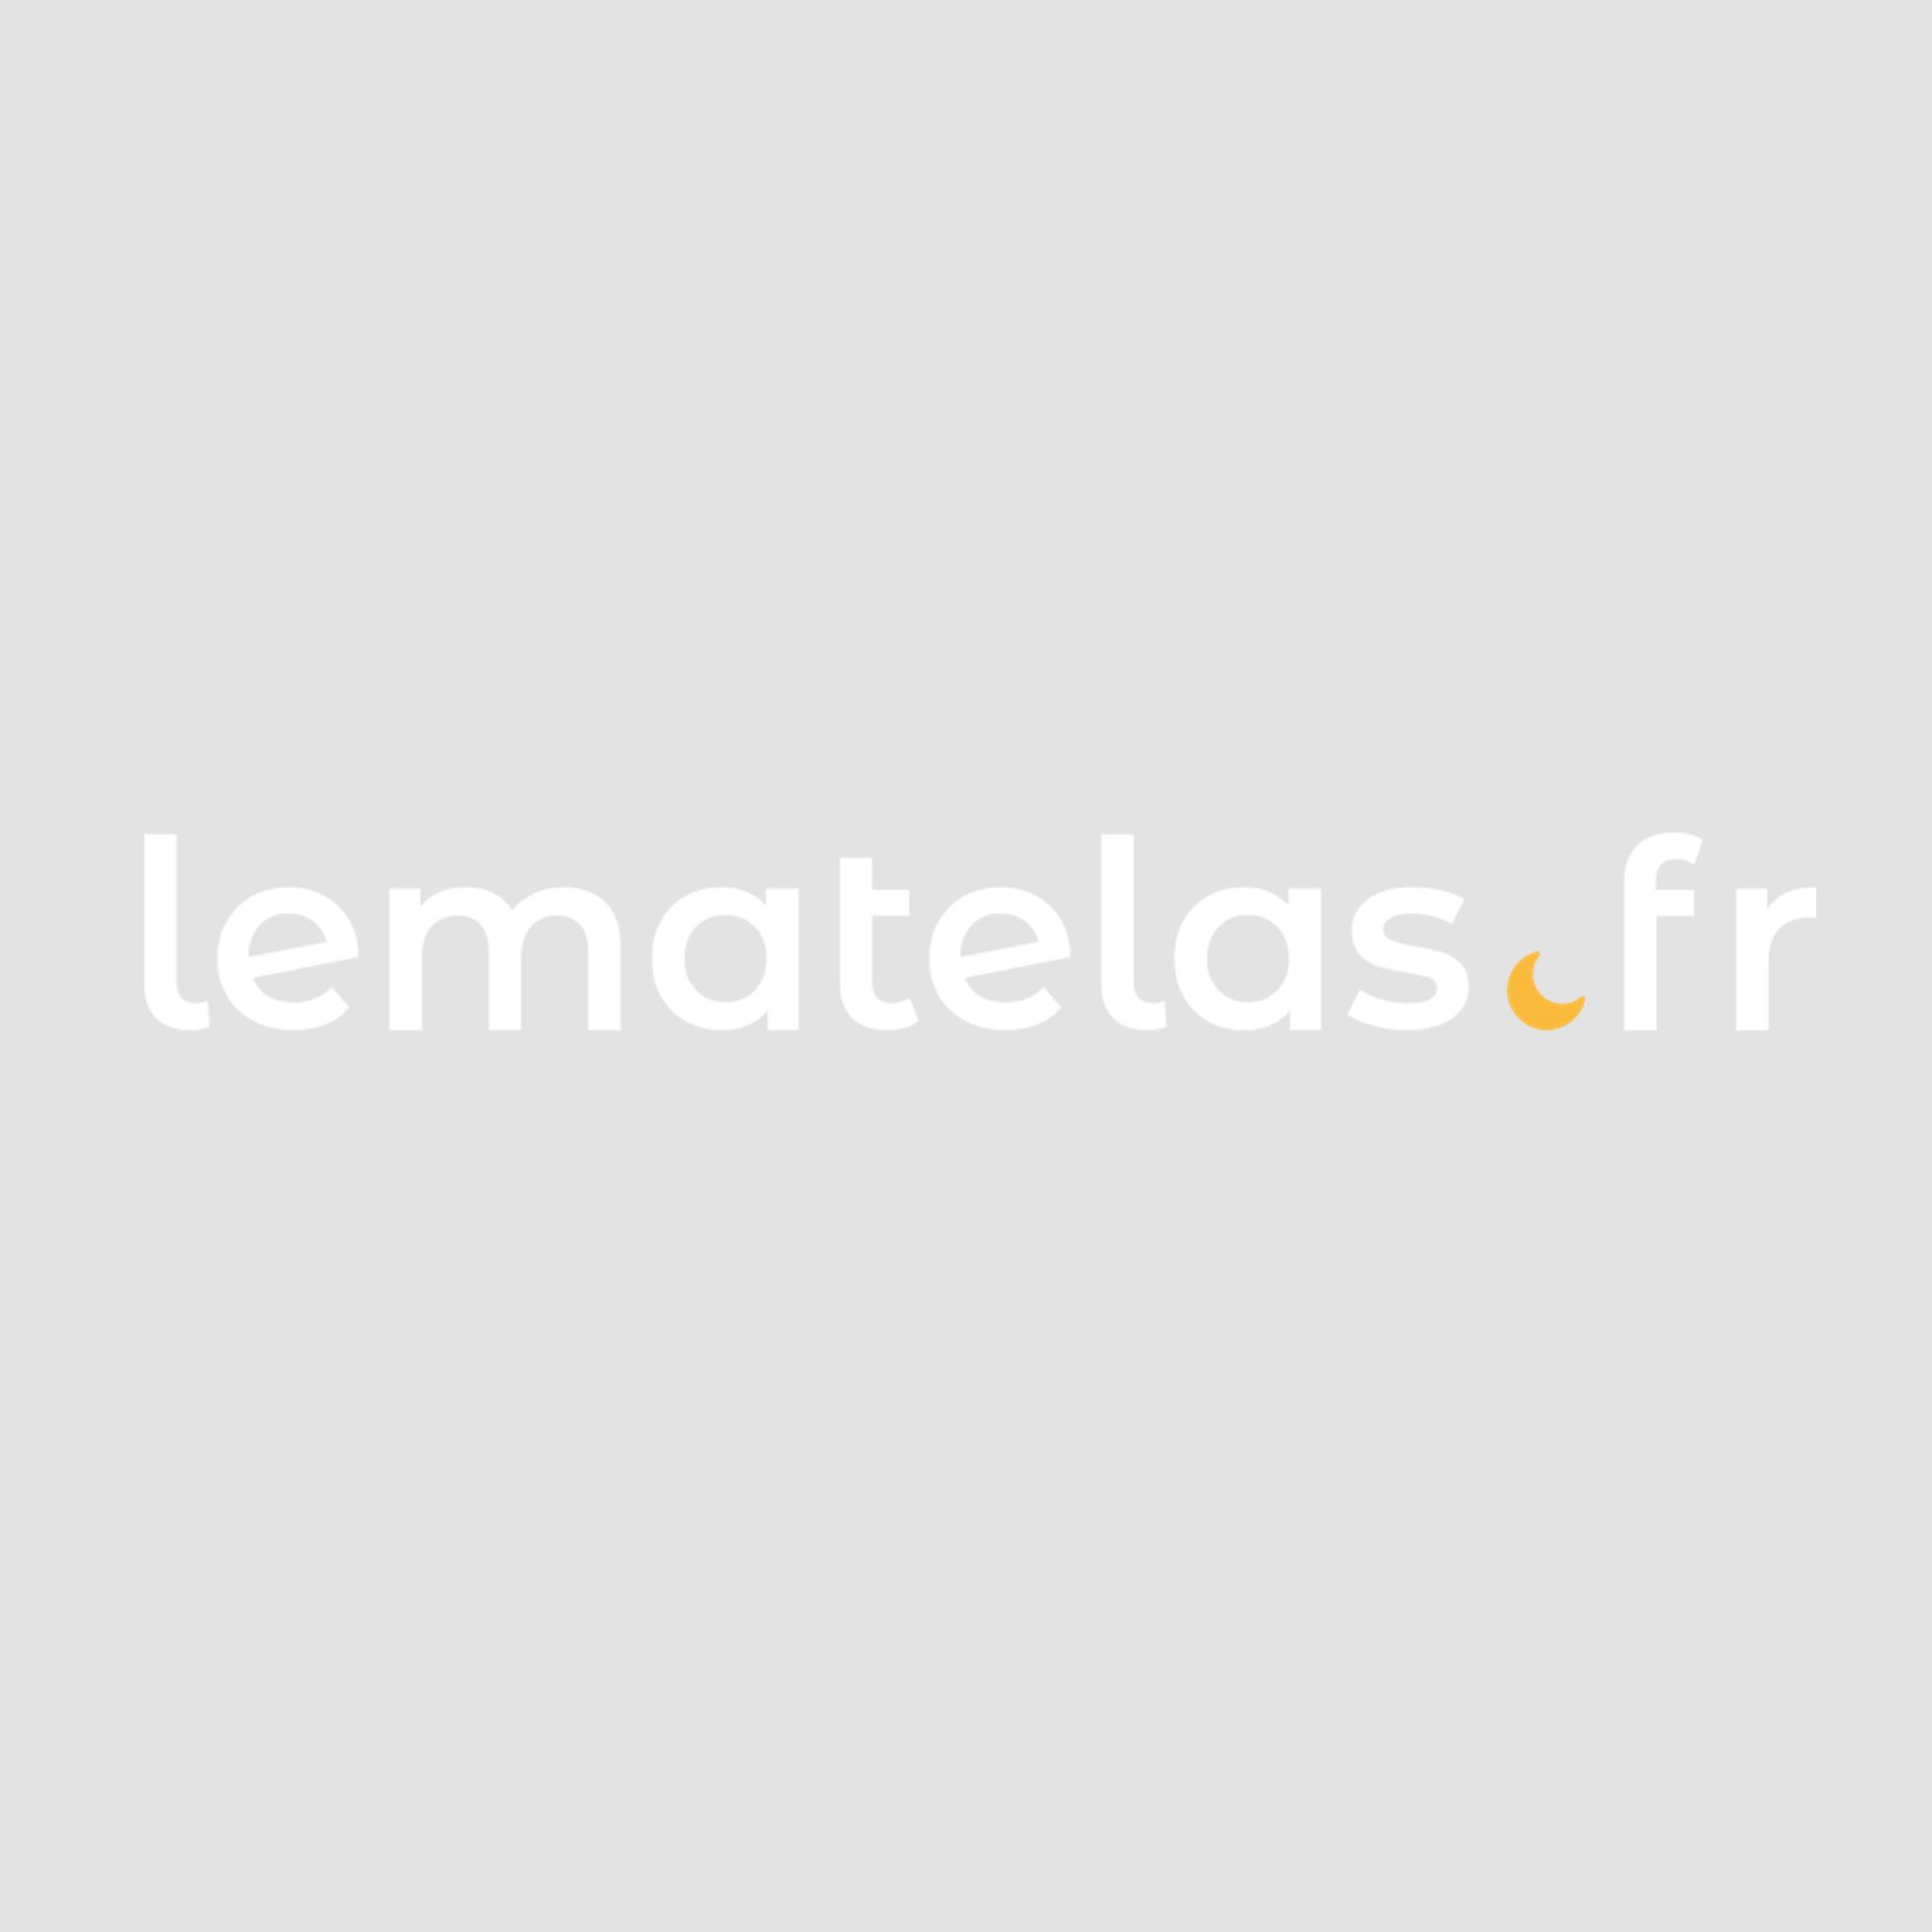 parure de lit london tradilinge. Black Bedroom Furniture Sets. Home Design Ideas